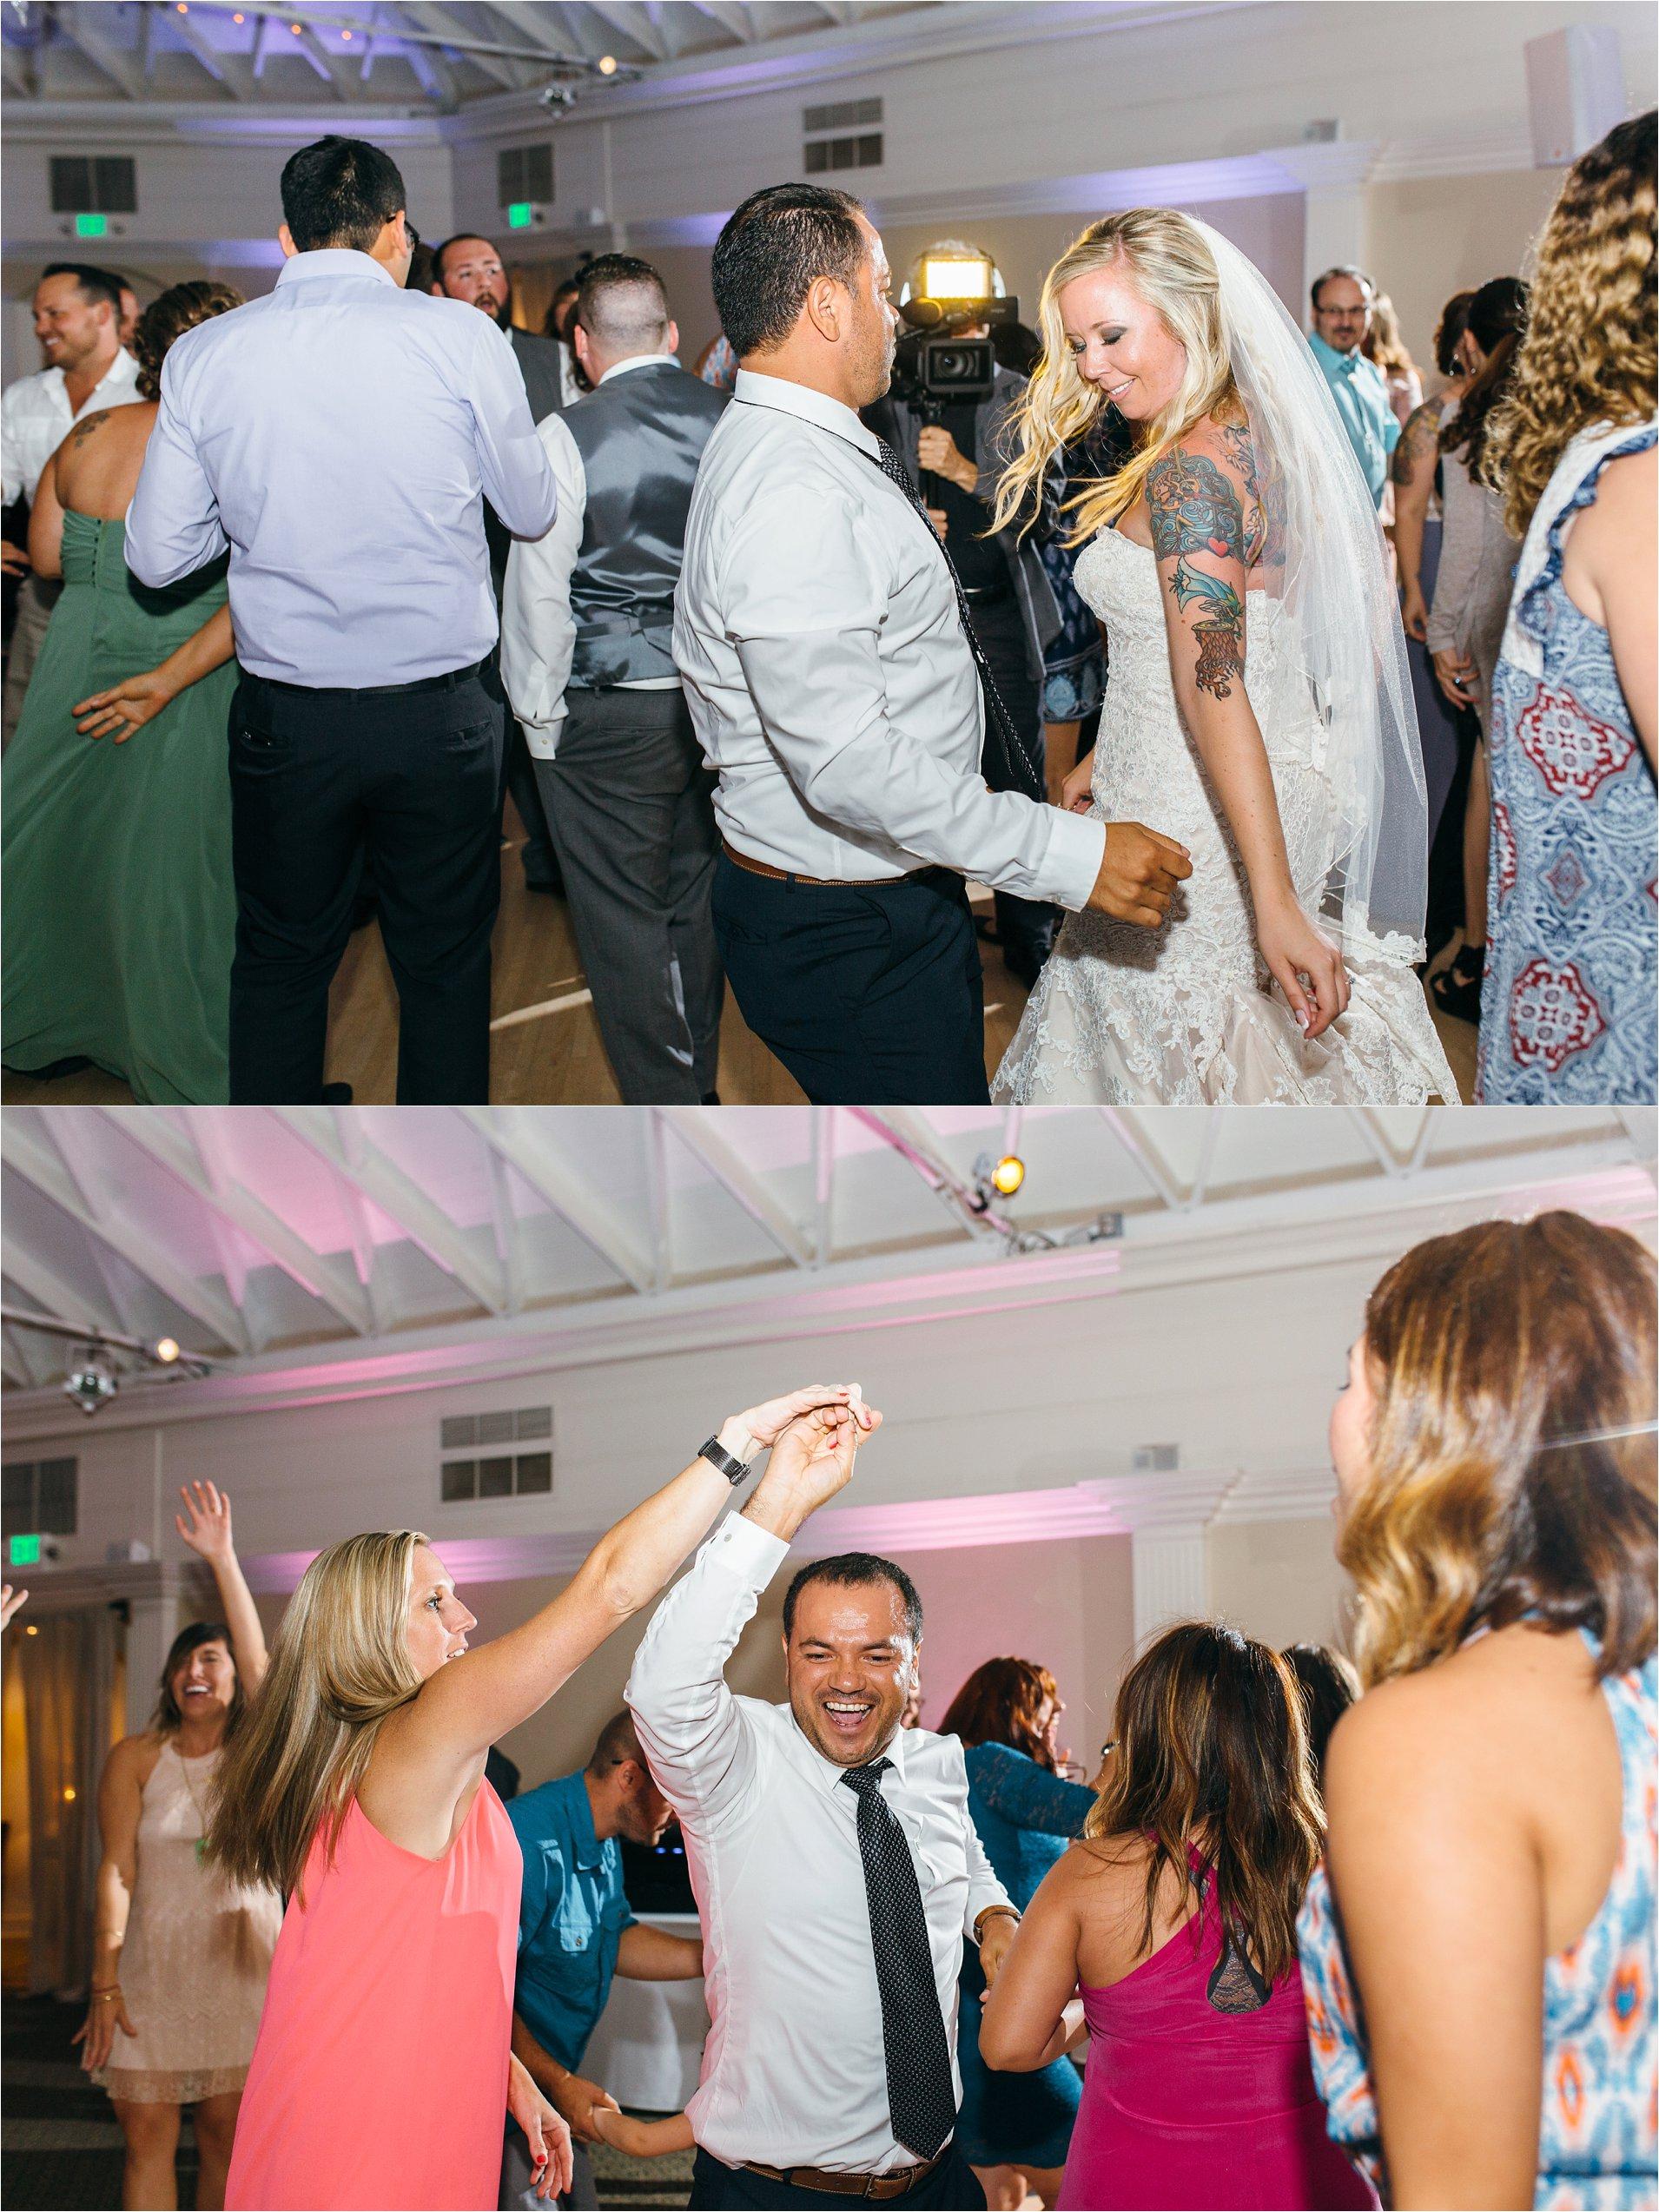 Guests Dancing at San Clemente Wedding